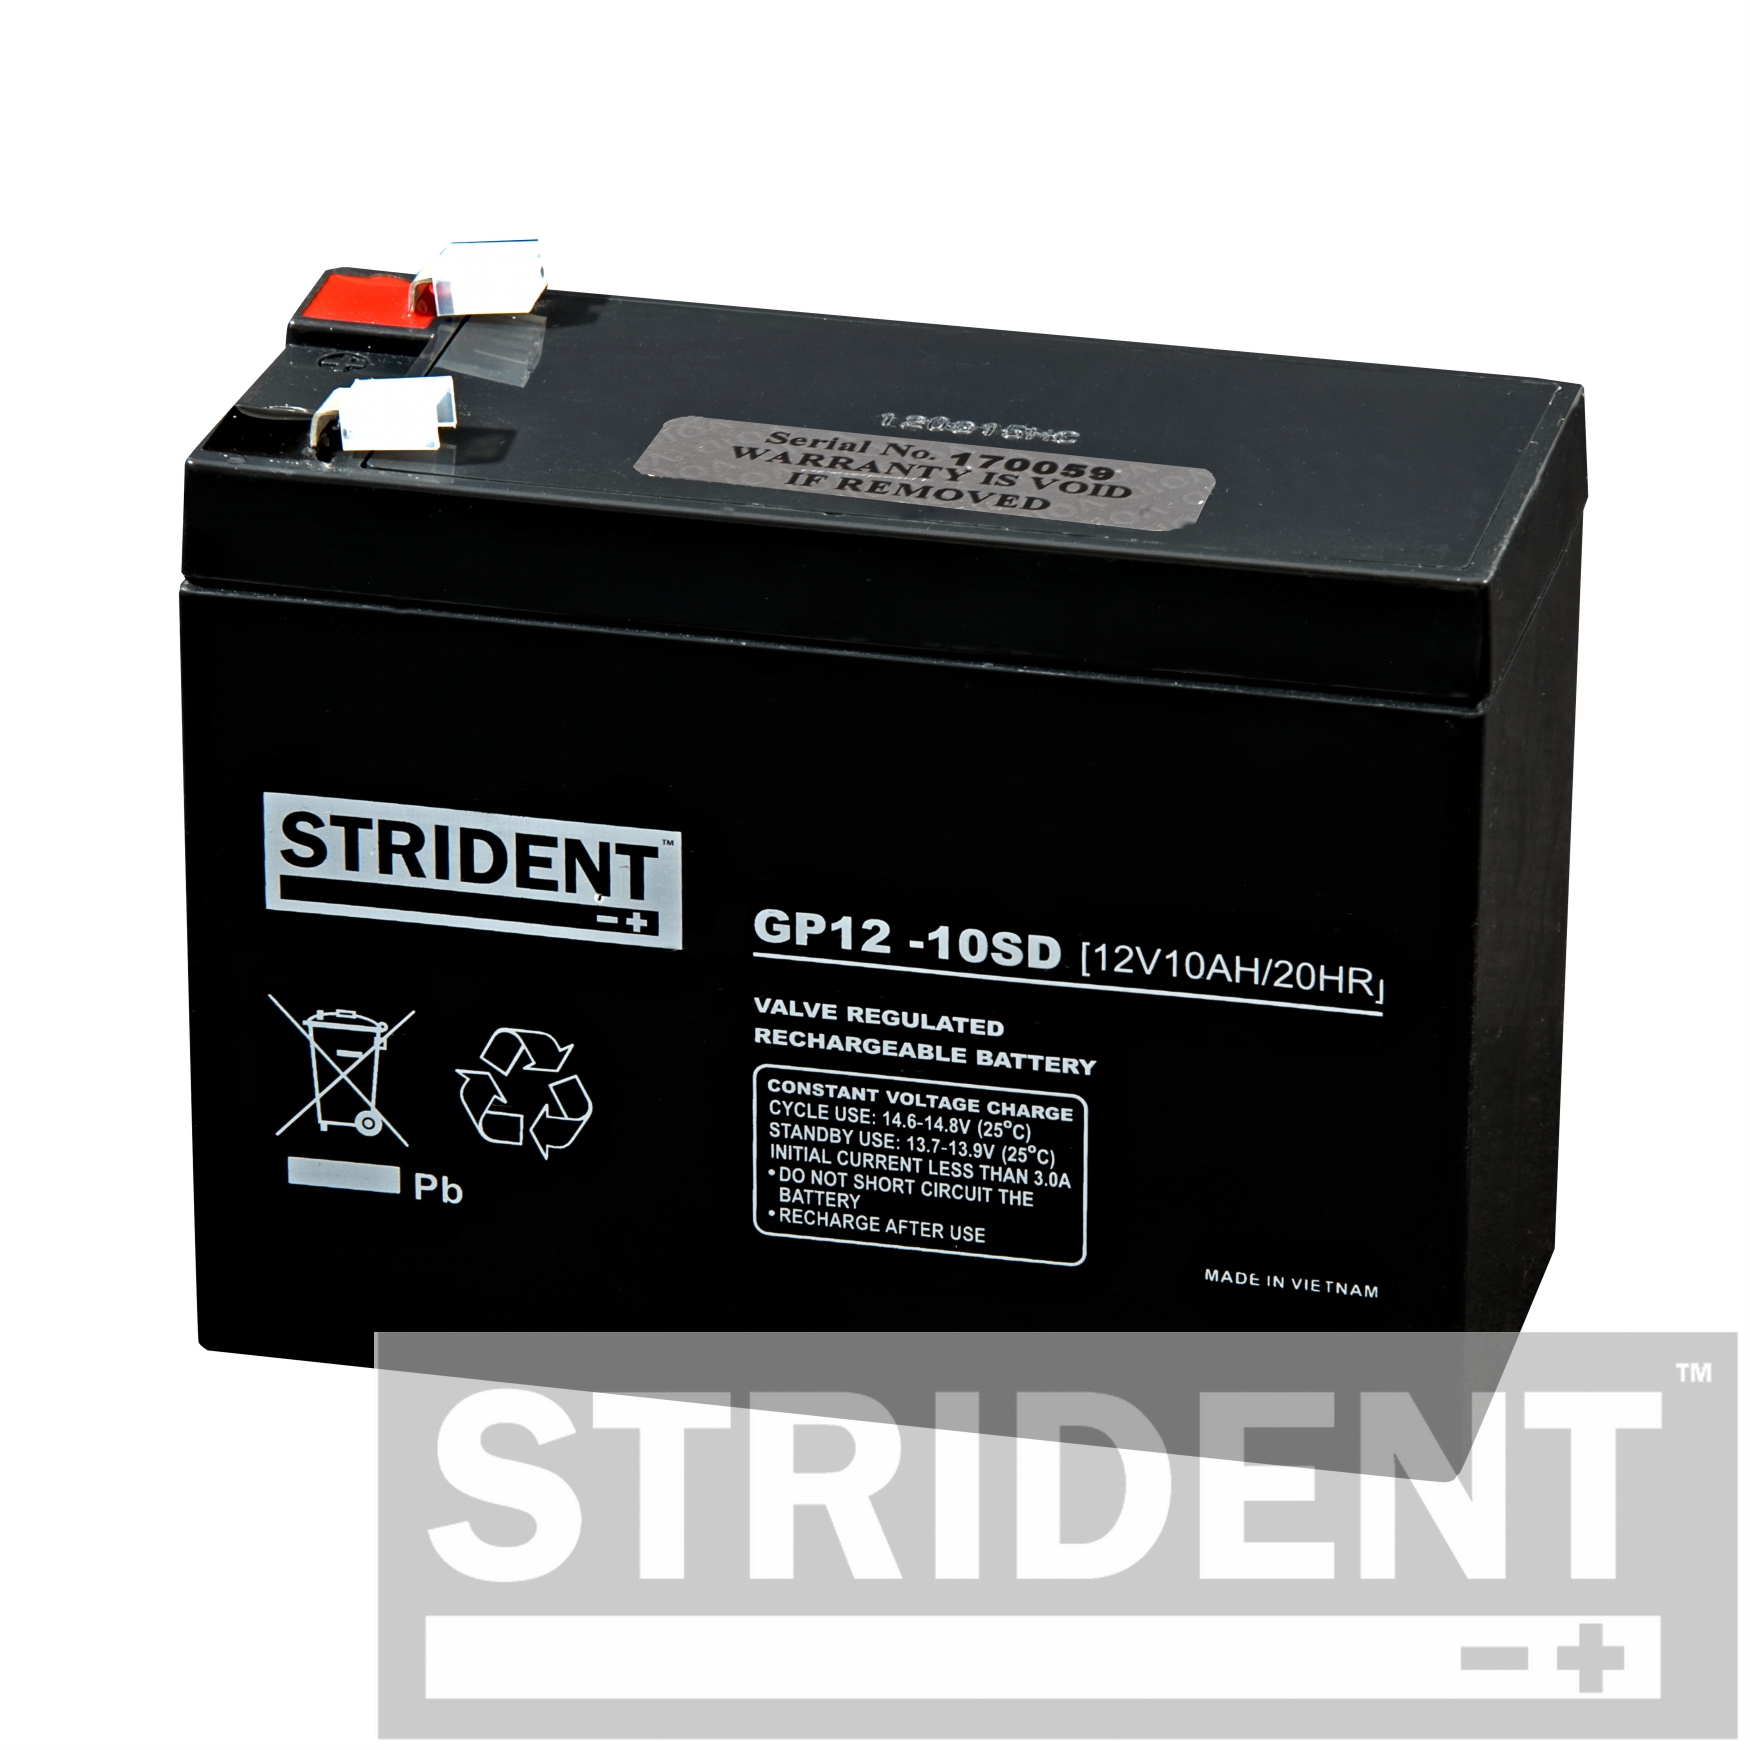 strident-agm-battery-gp12-10.jpg